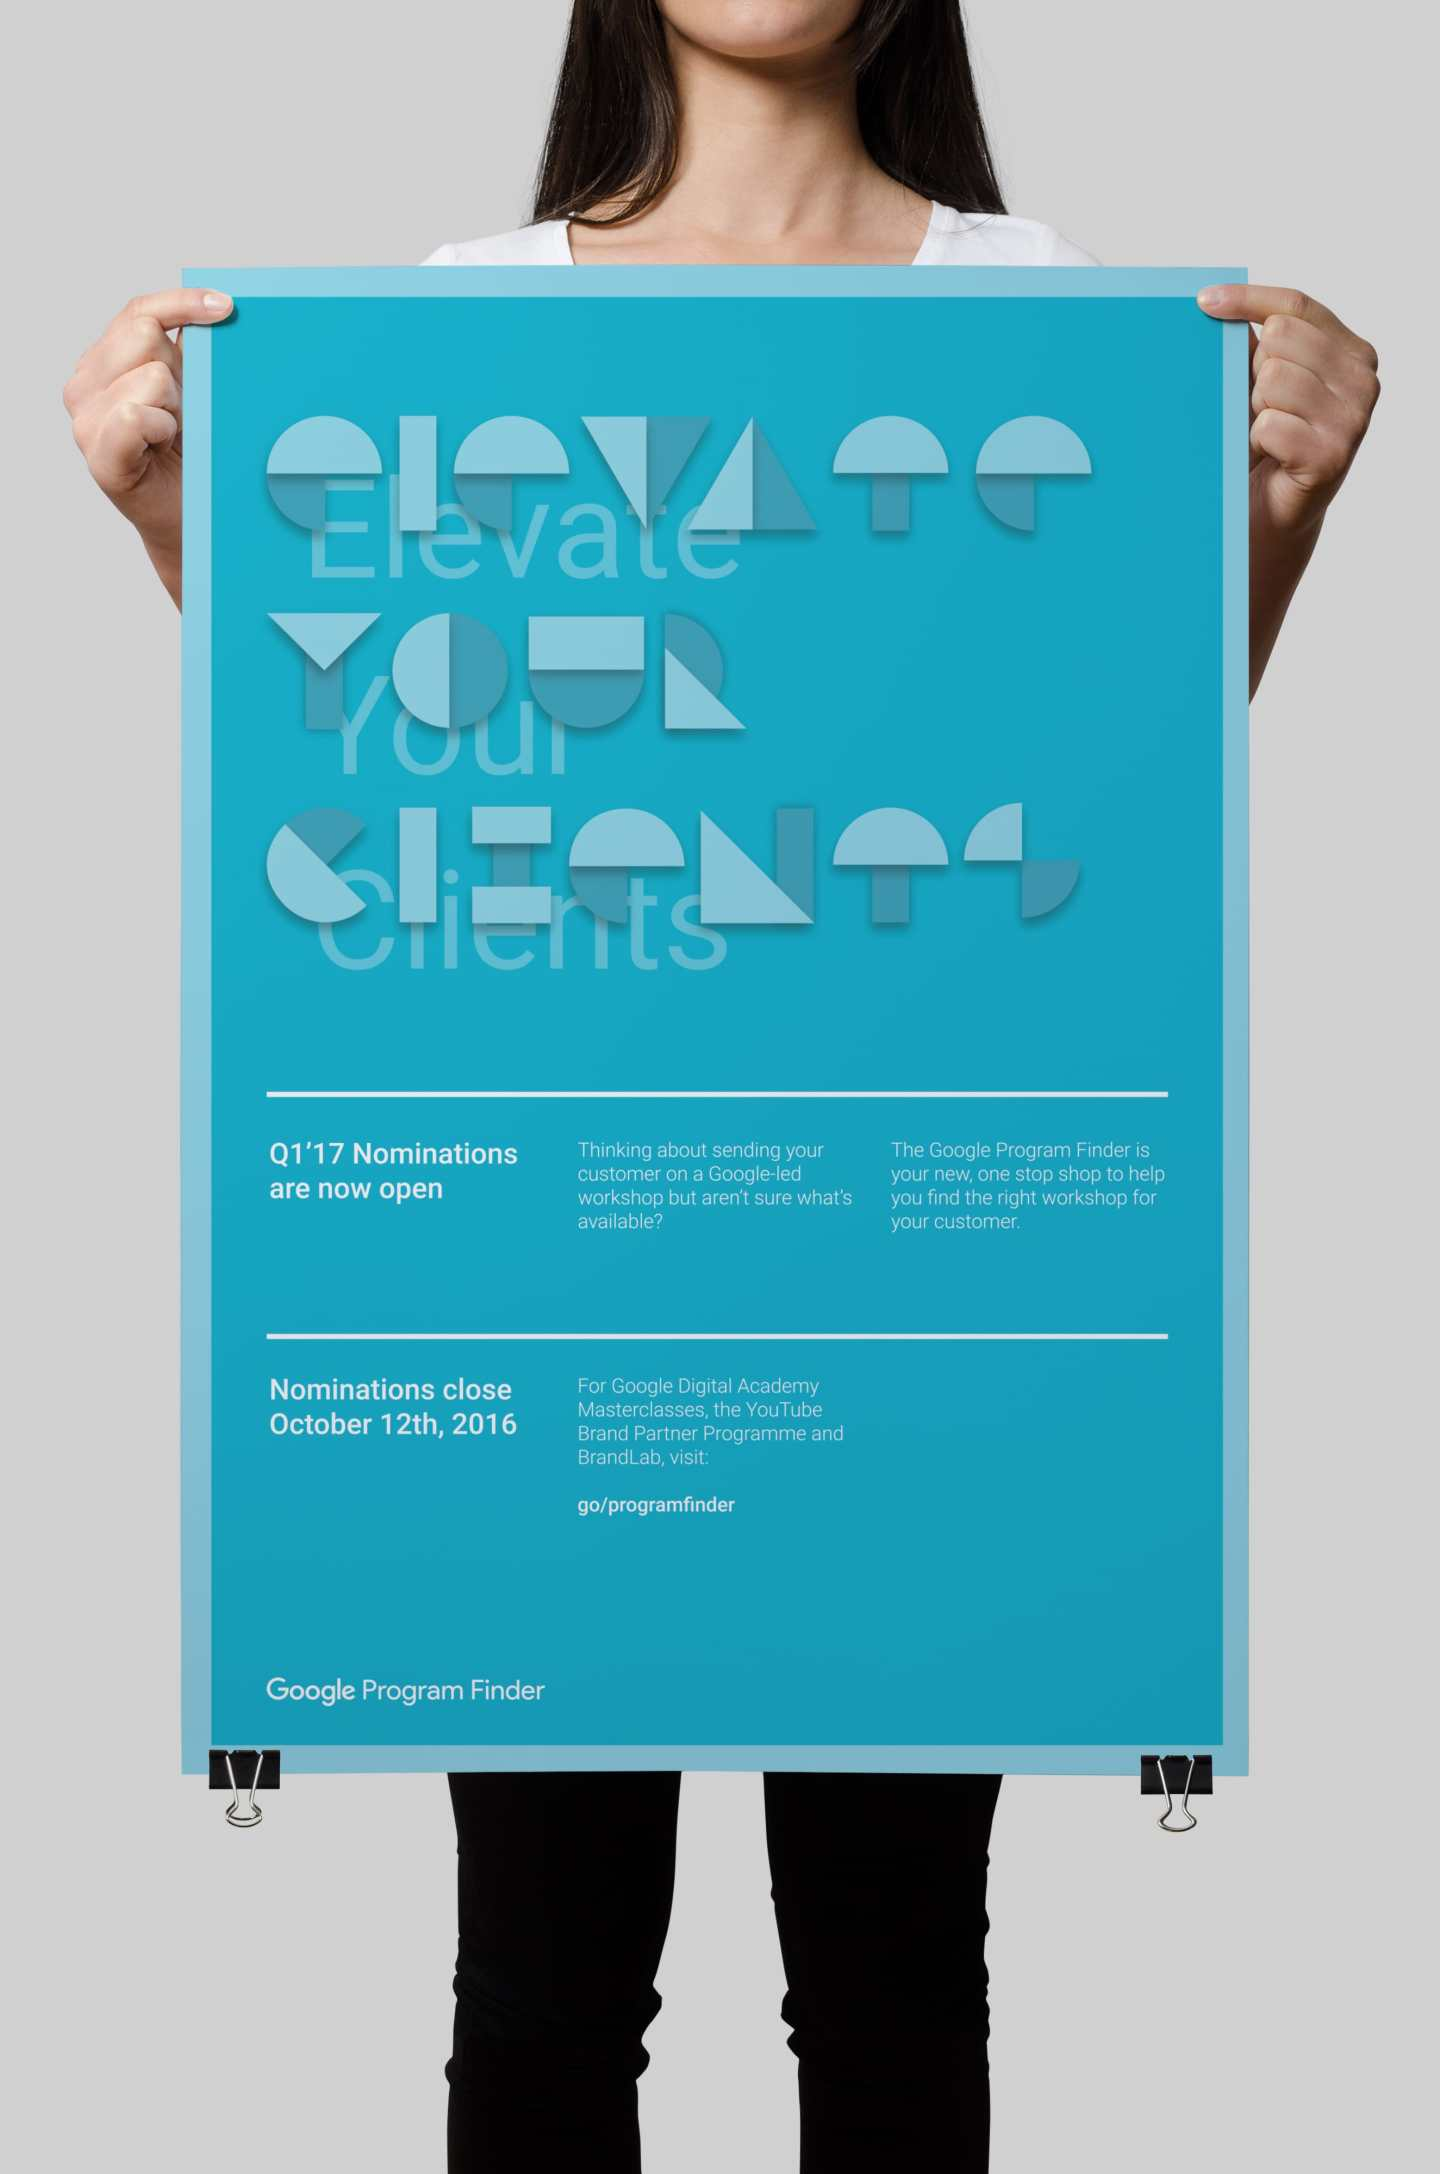 Google GTOC Material Design Color Palette Poster